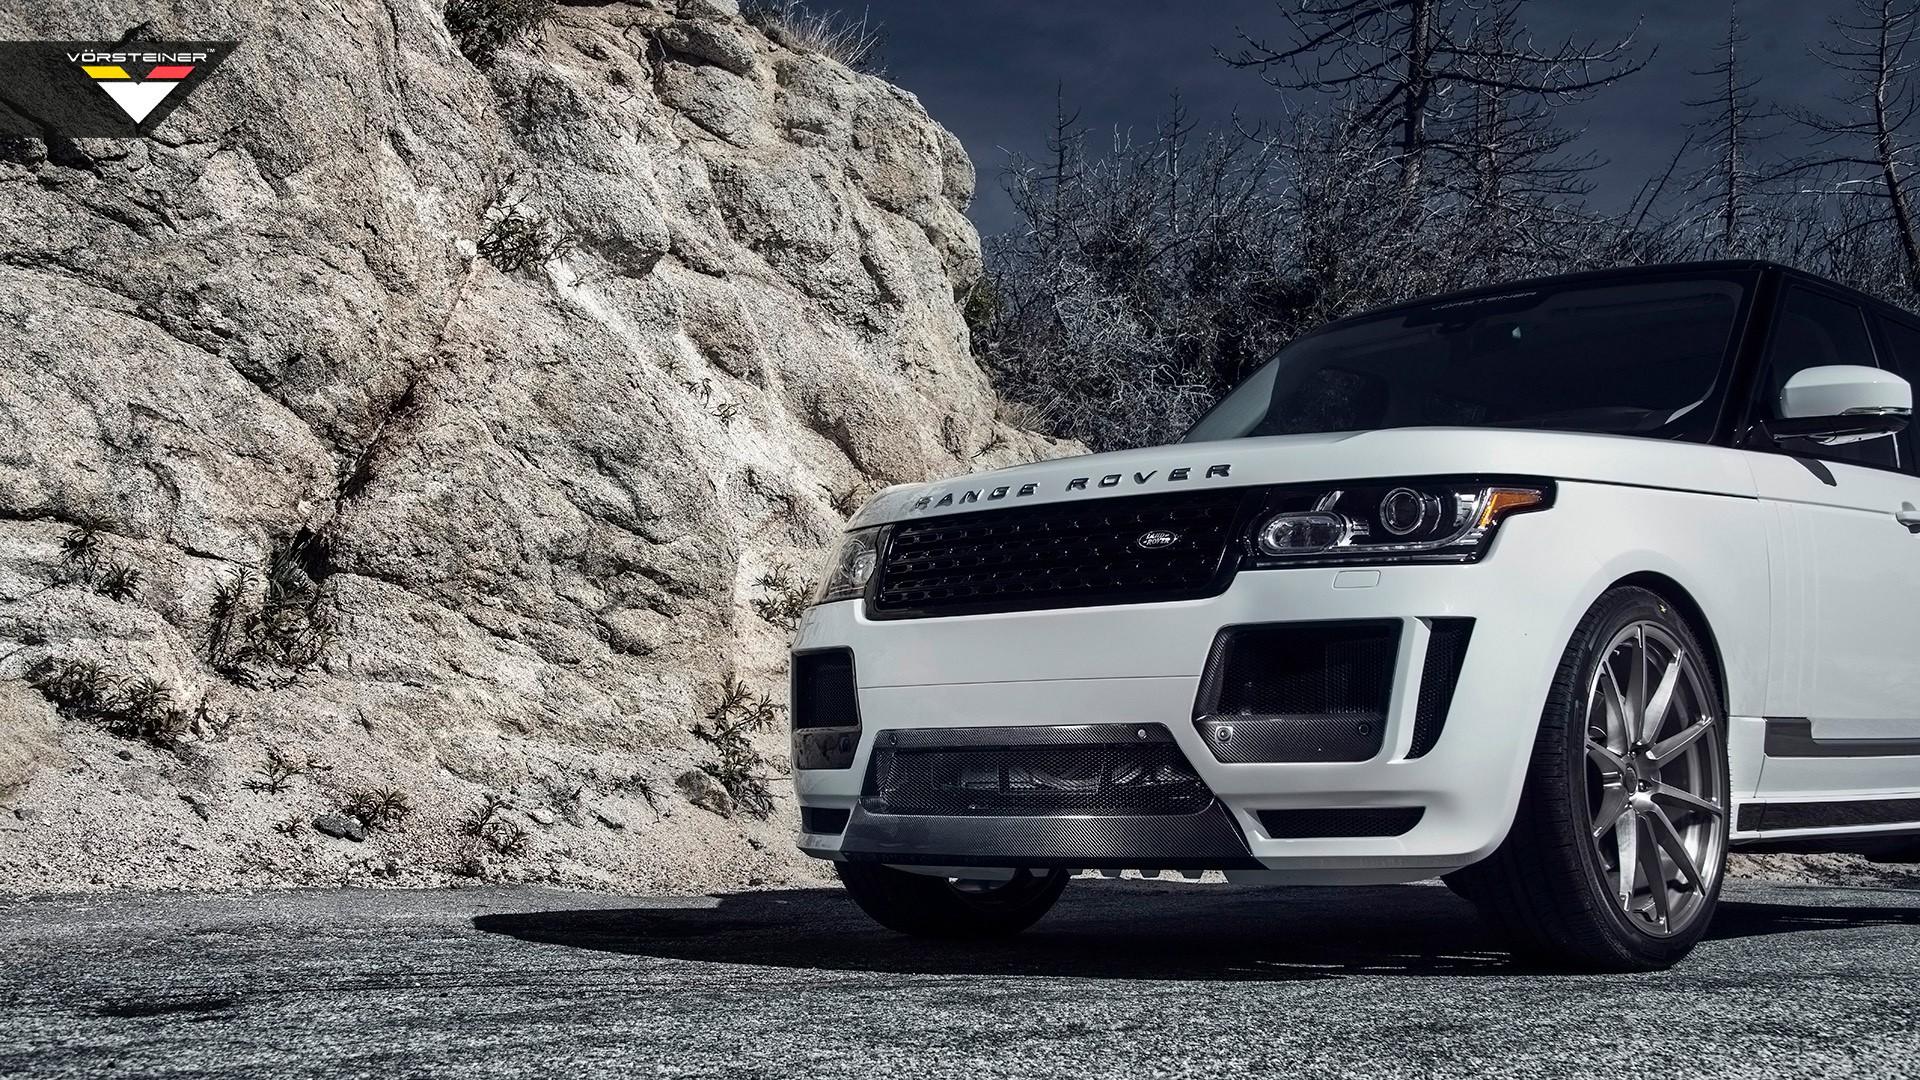 Bmw Hd Wallpapers 1080p Download 2014 Vorsteiner Range Rover Veritas Wallpaper Hd Car